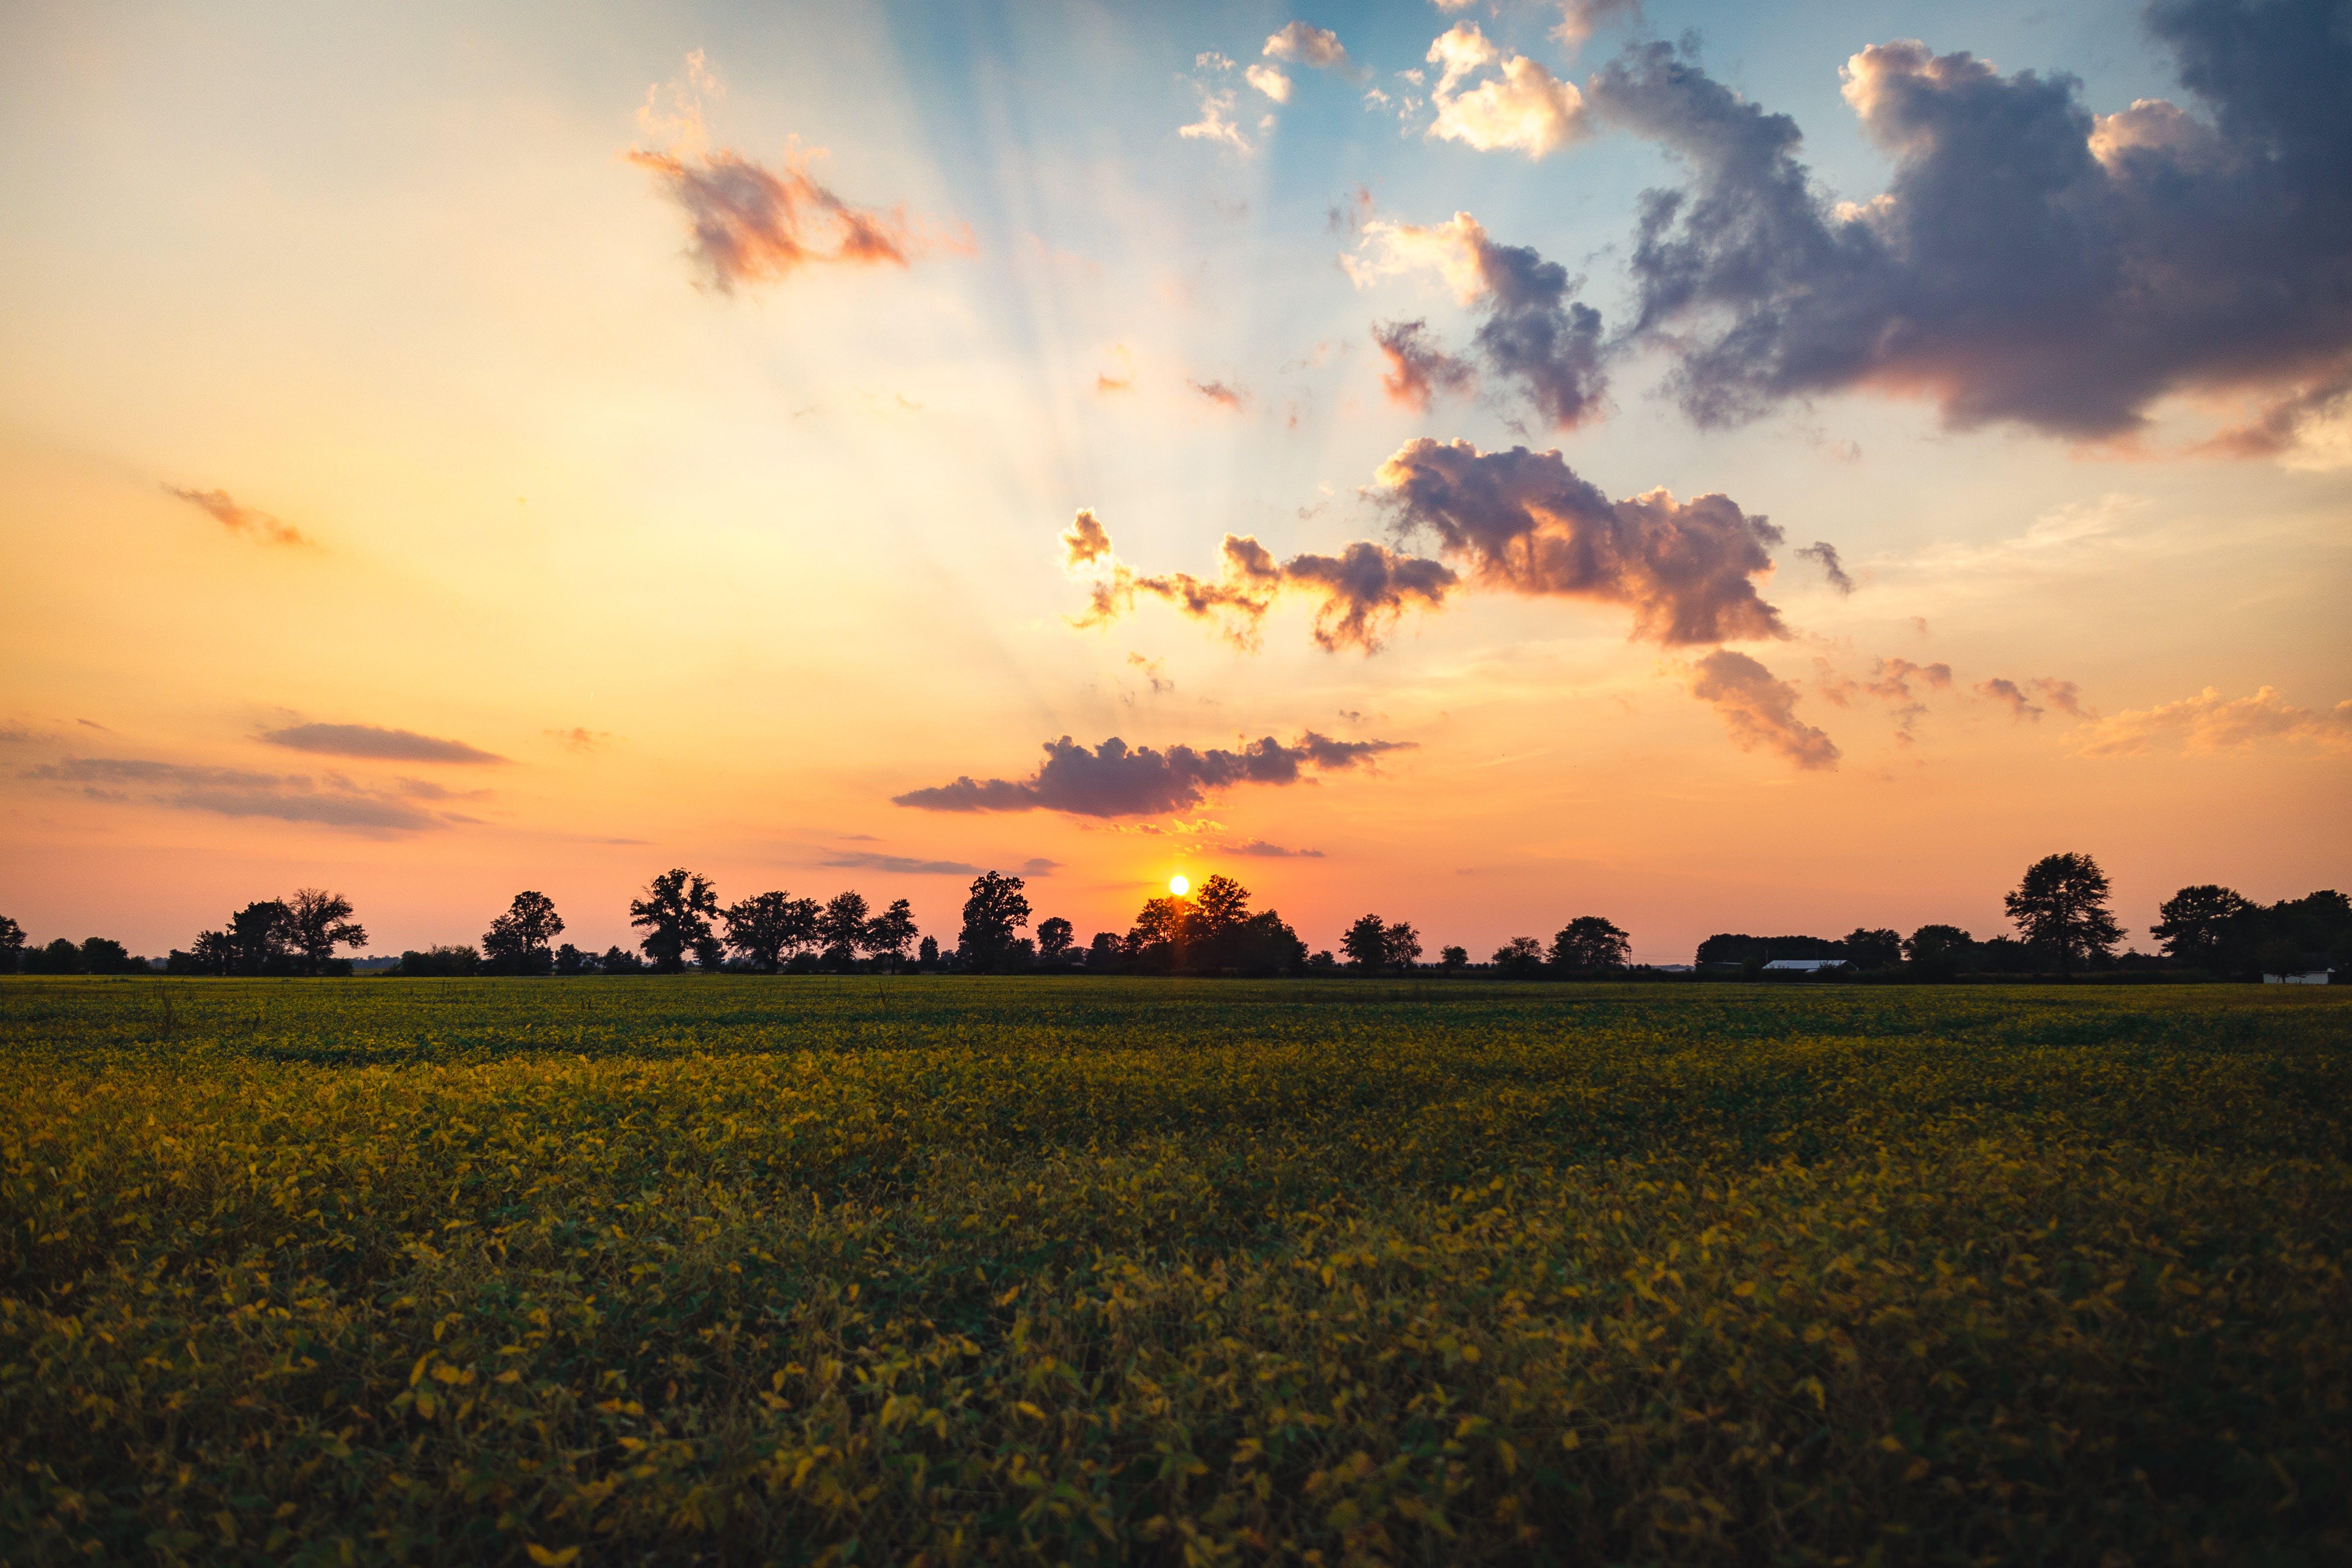 clouds, field, lawn